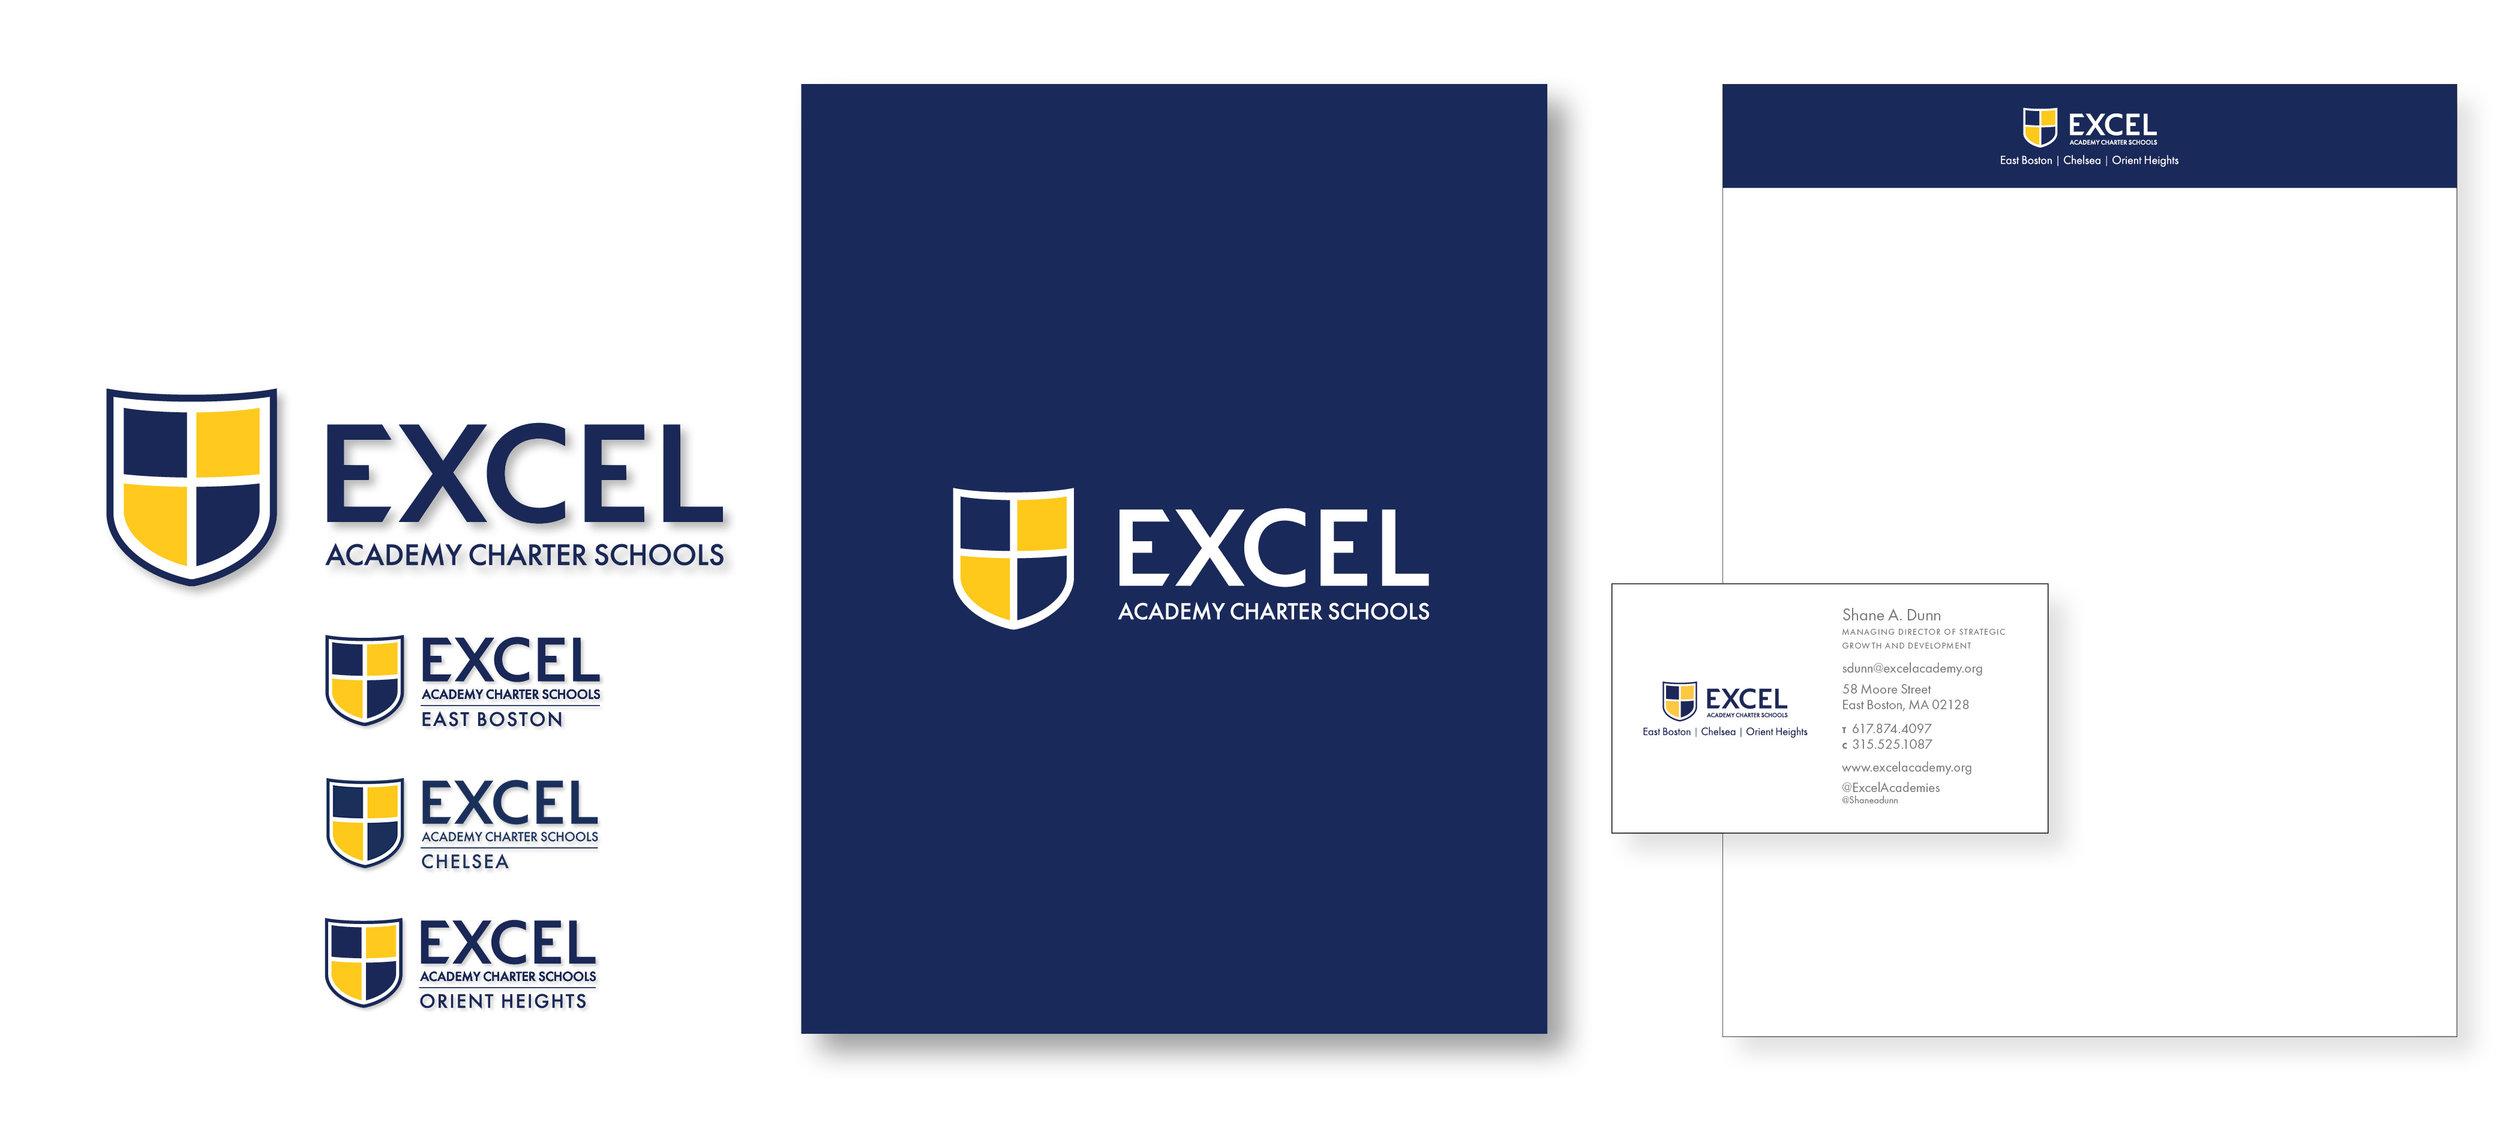 Excel Academy New Frames2.jpg